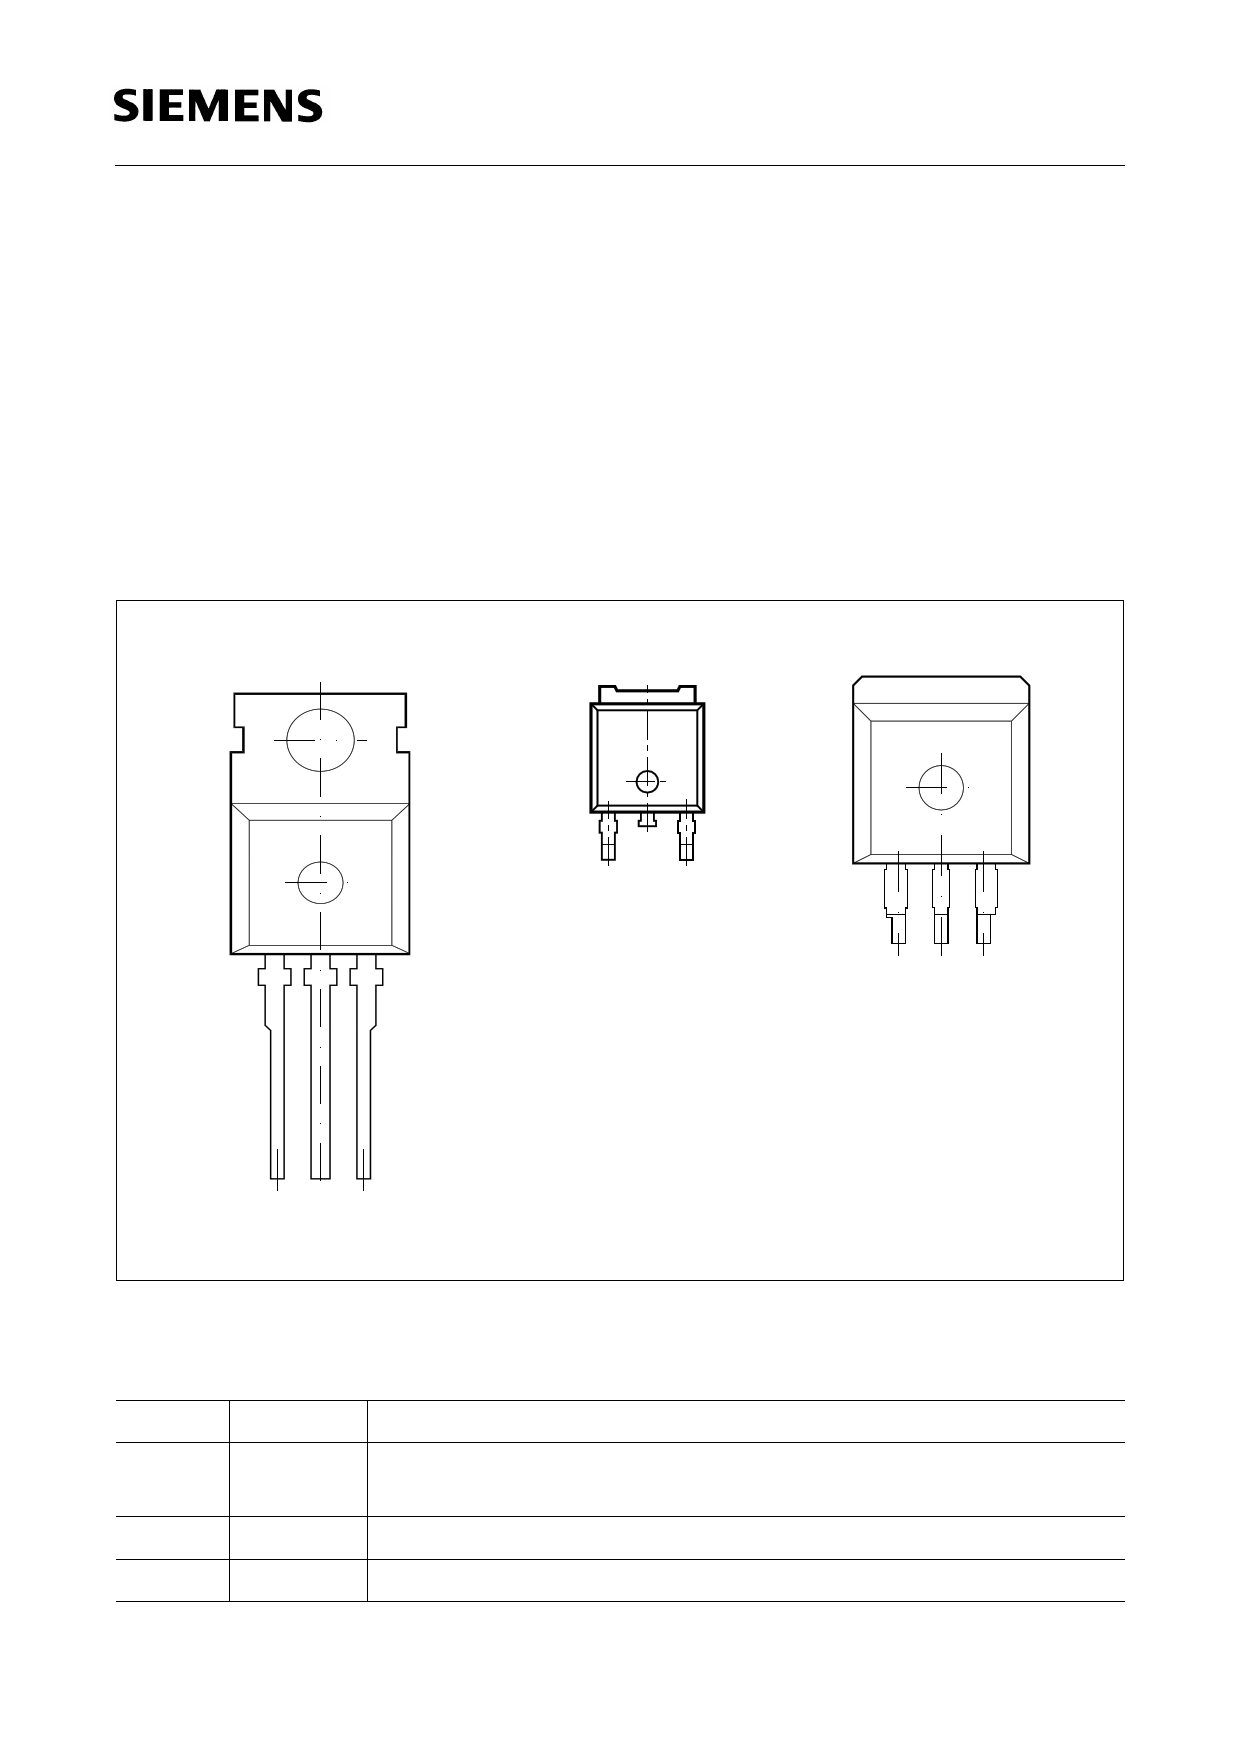 4274GV50 pdf schematic